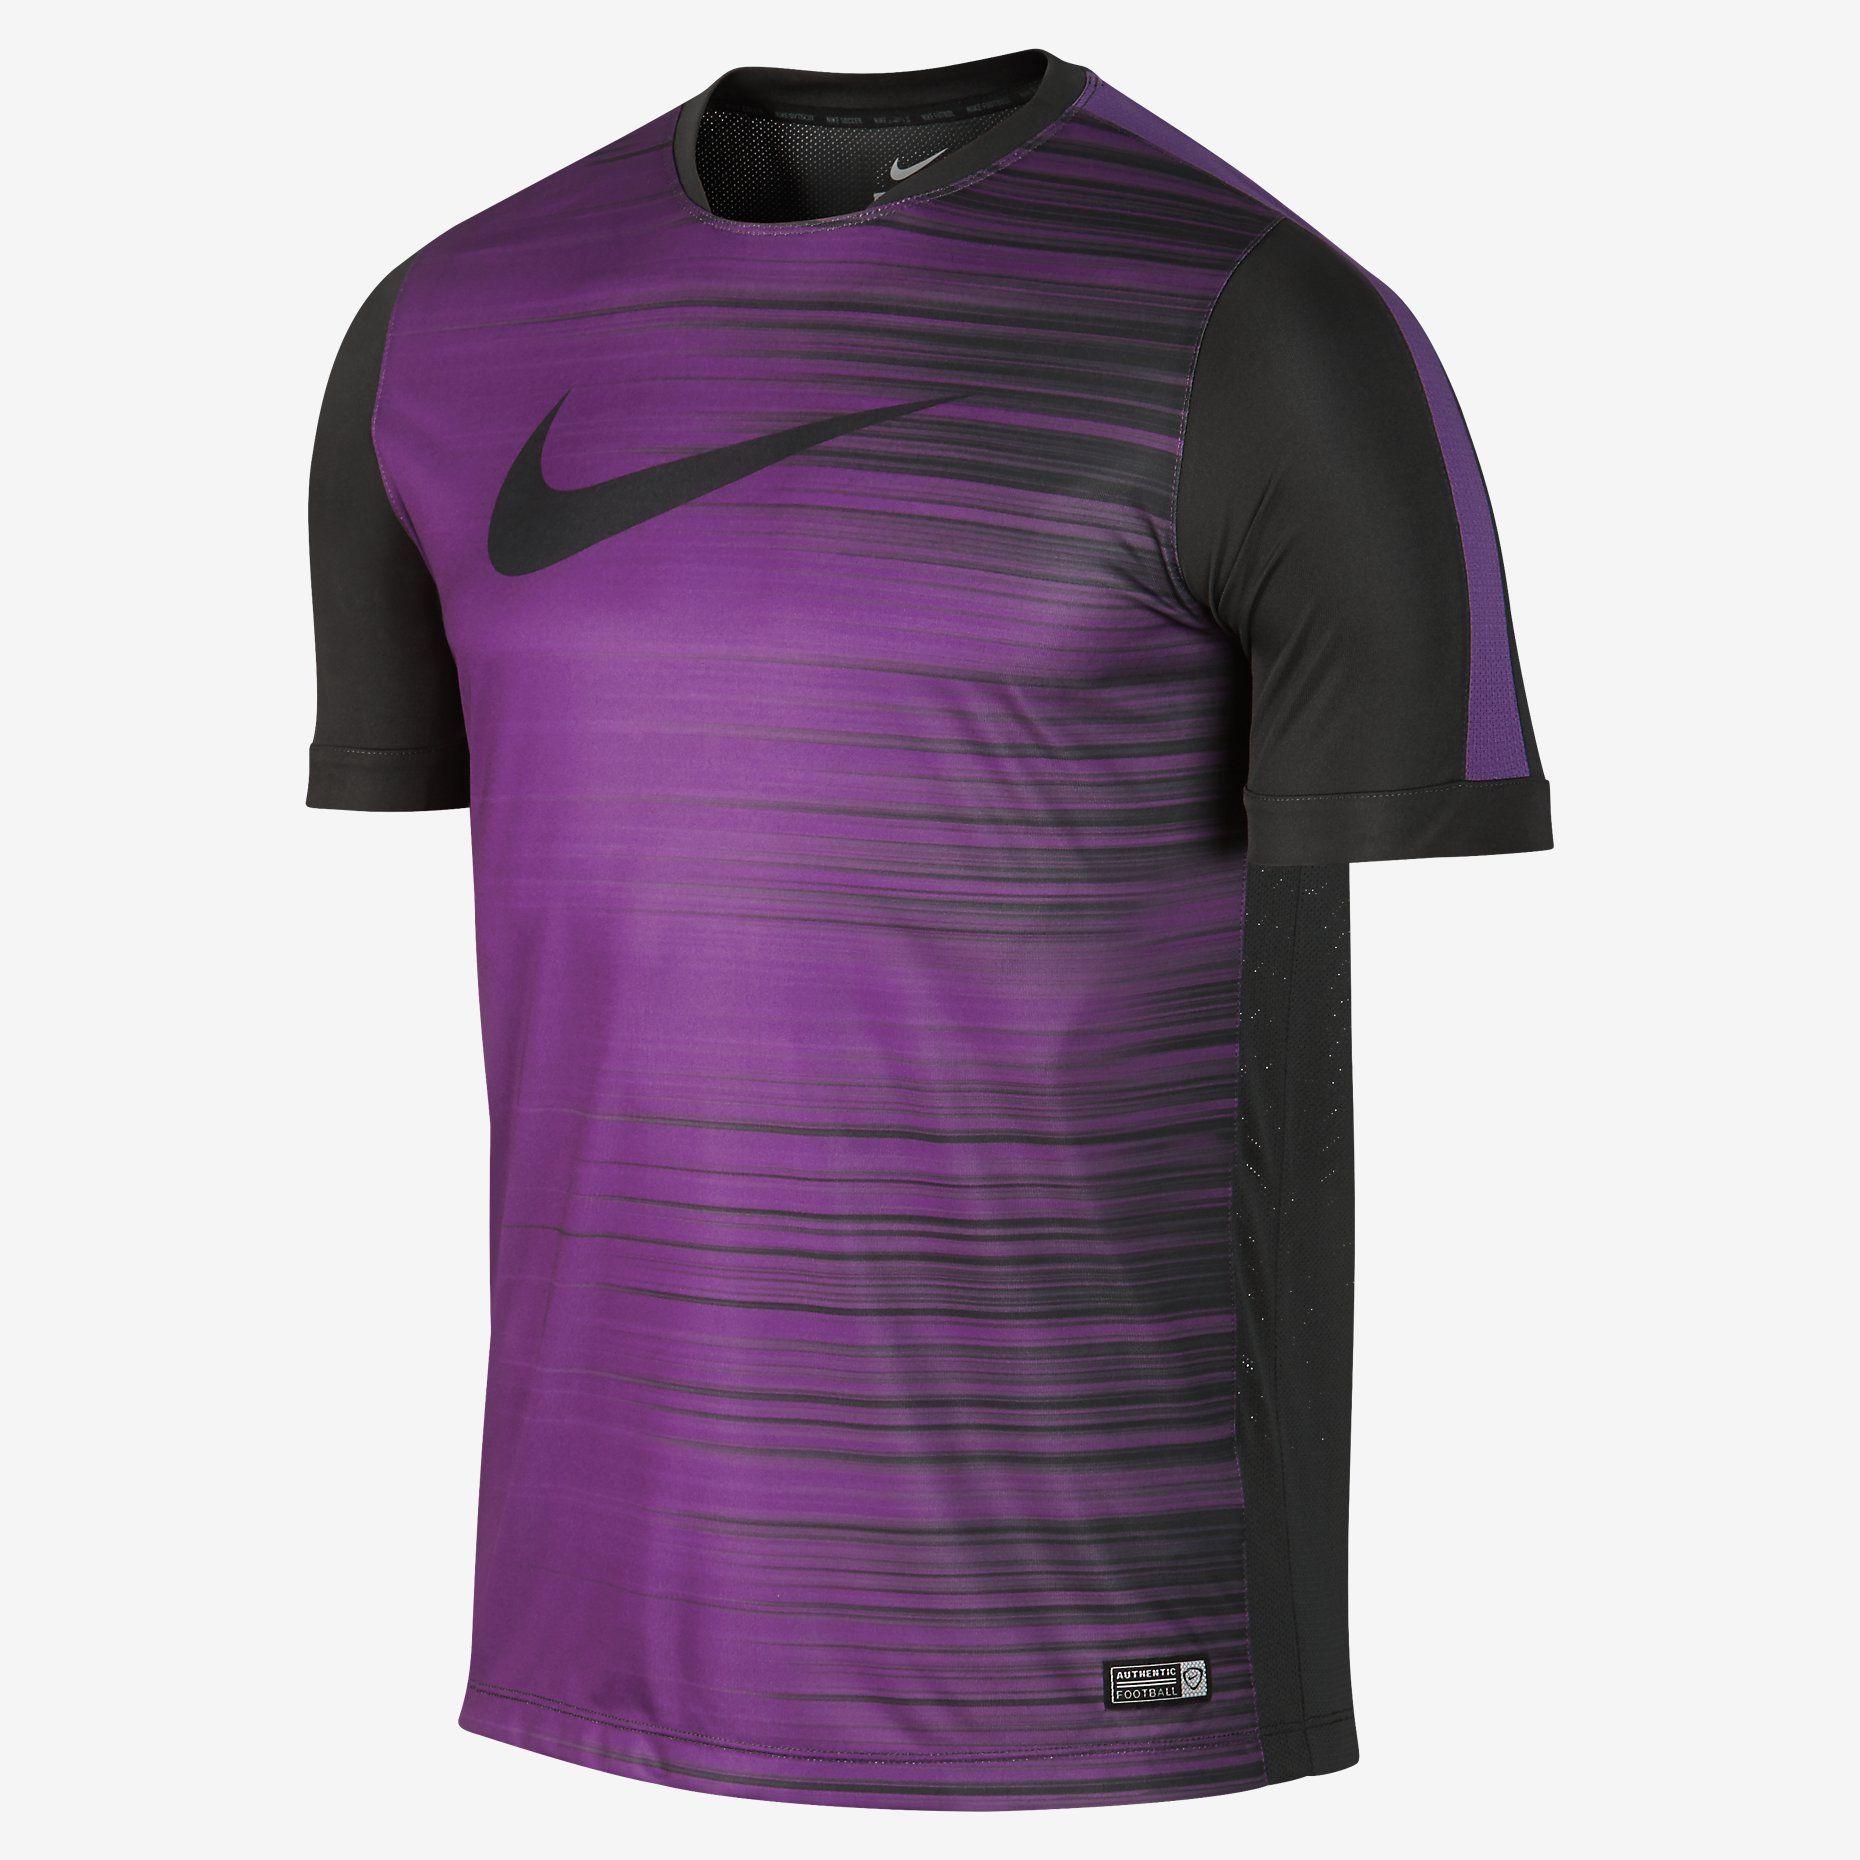 Nike Flash Top Men S Soccer Shirt Nike Store Camisetas Masculinas Estilo De Rua Camiseta